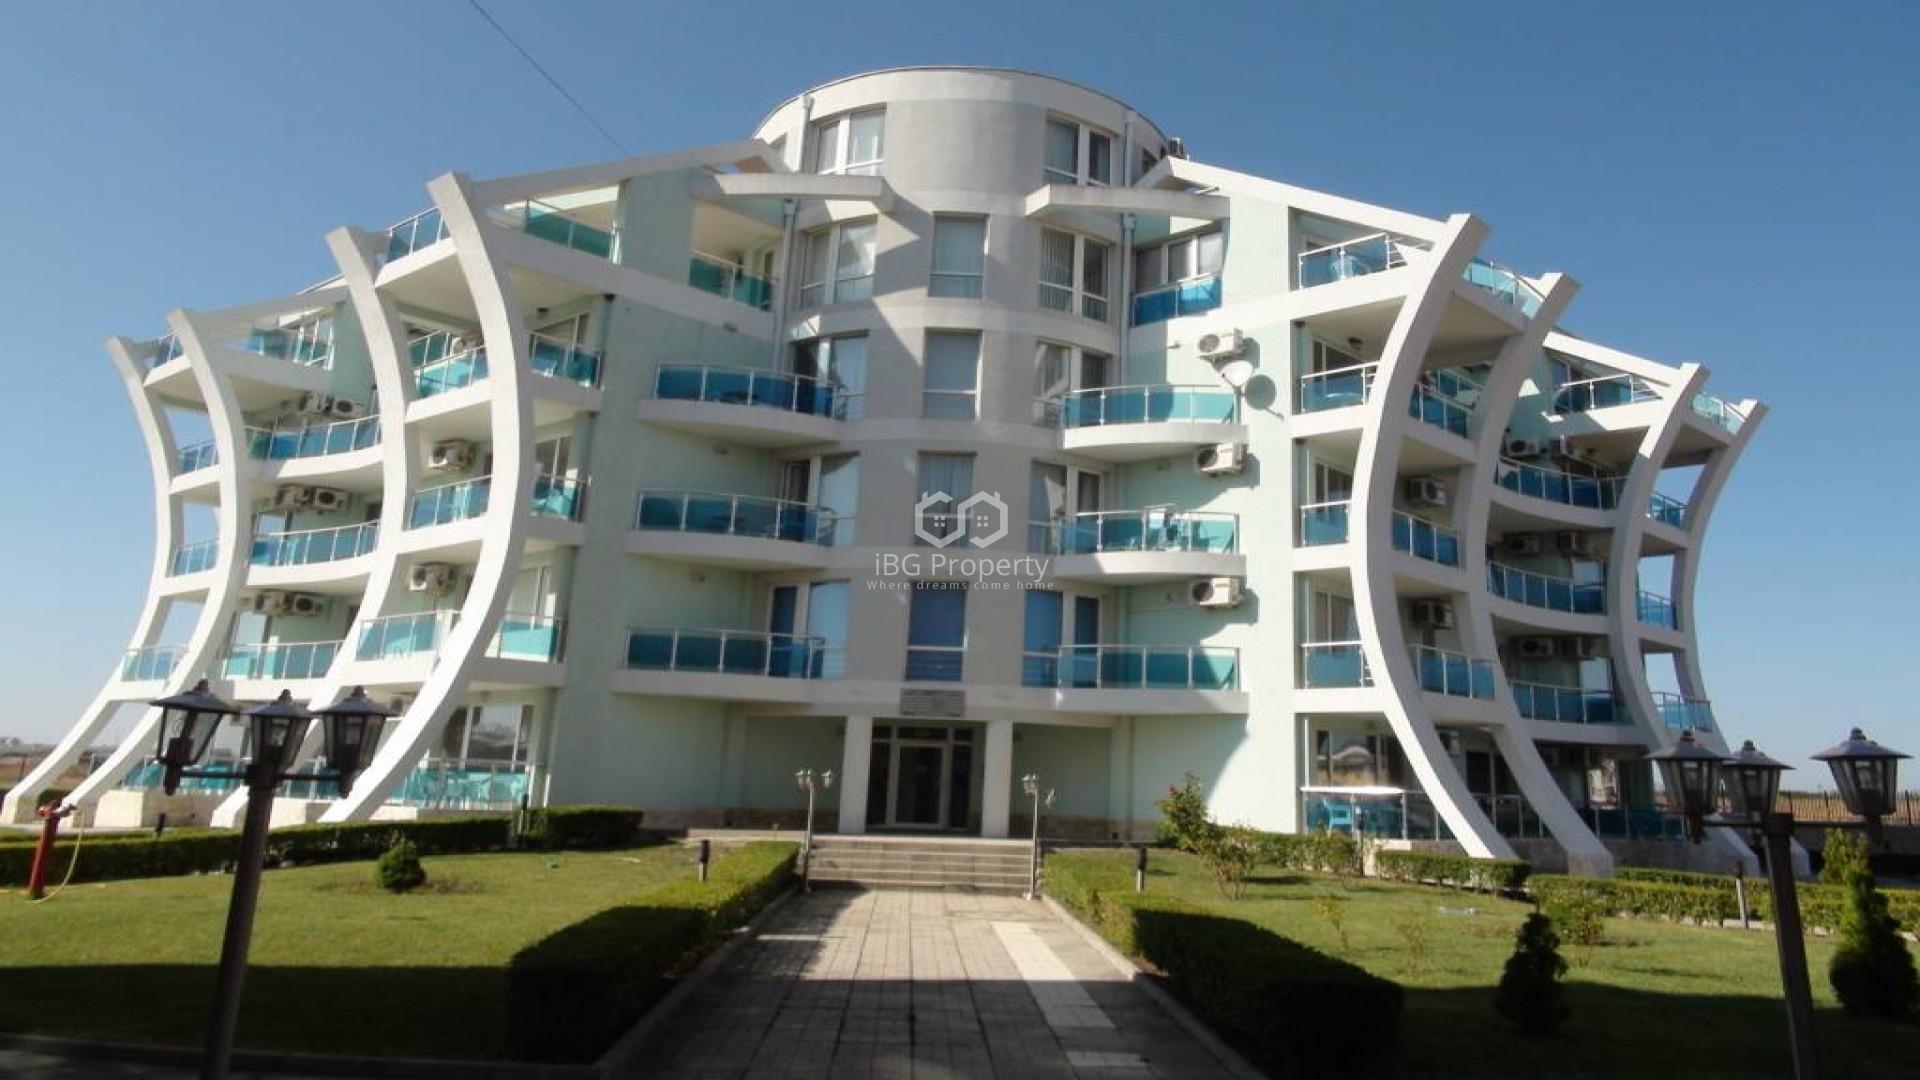 Двухкомнатная квартира Ахелой 65  m2